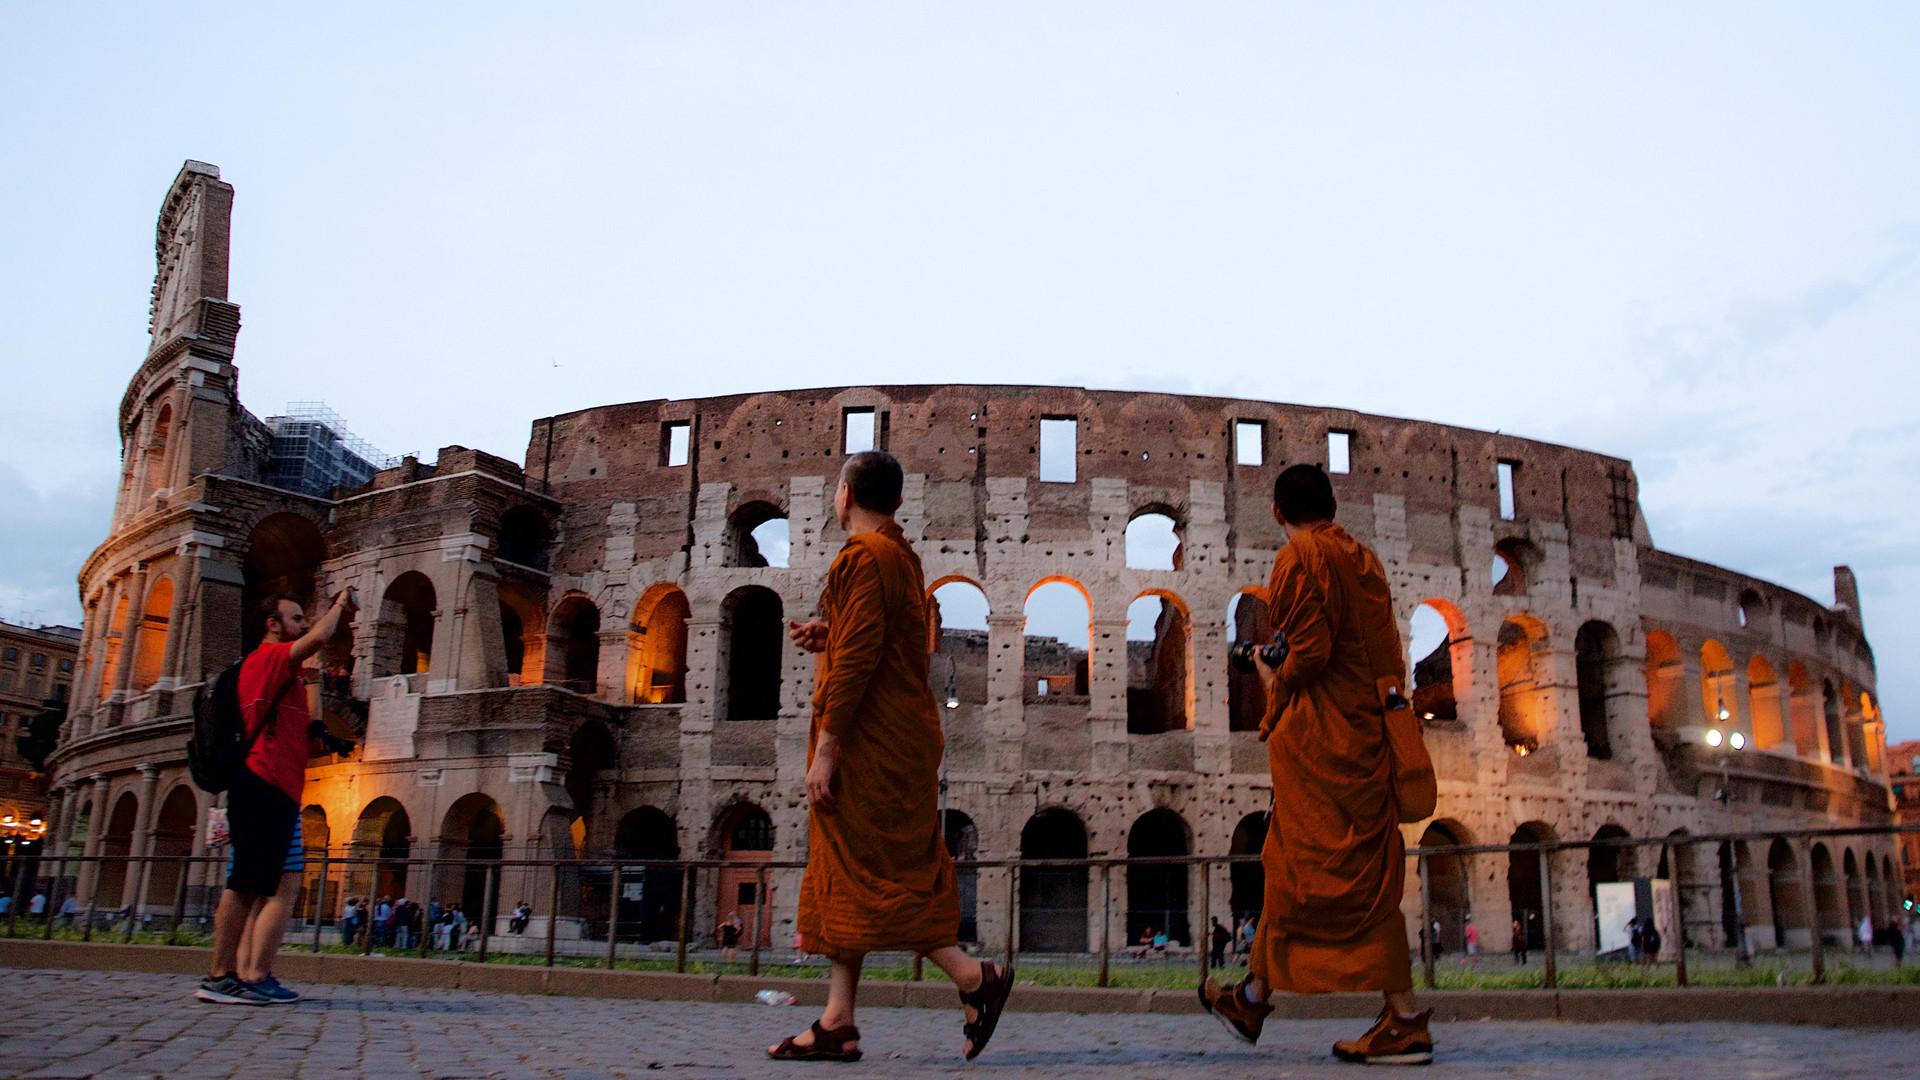 Tibetan Monks at the Colosseum